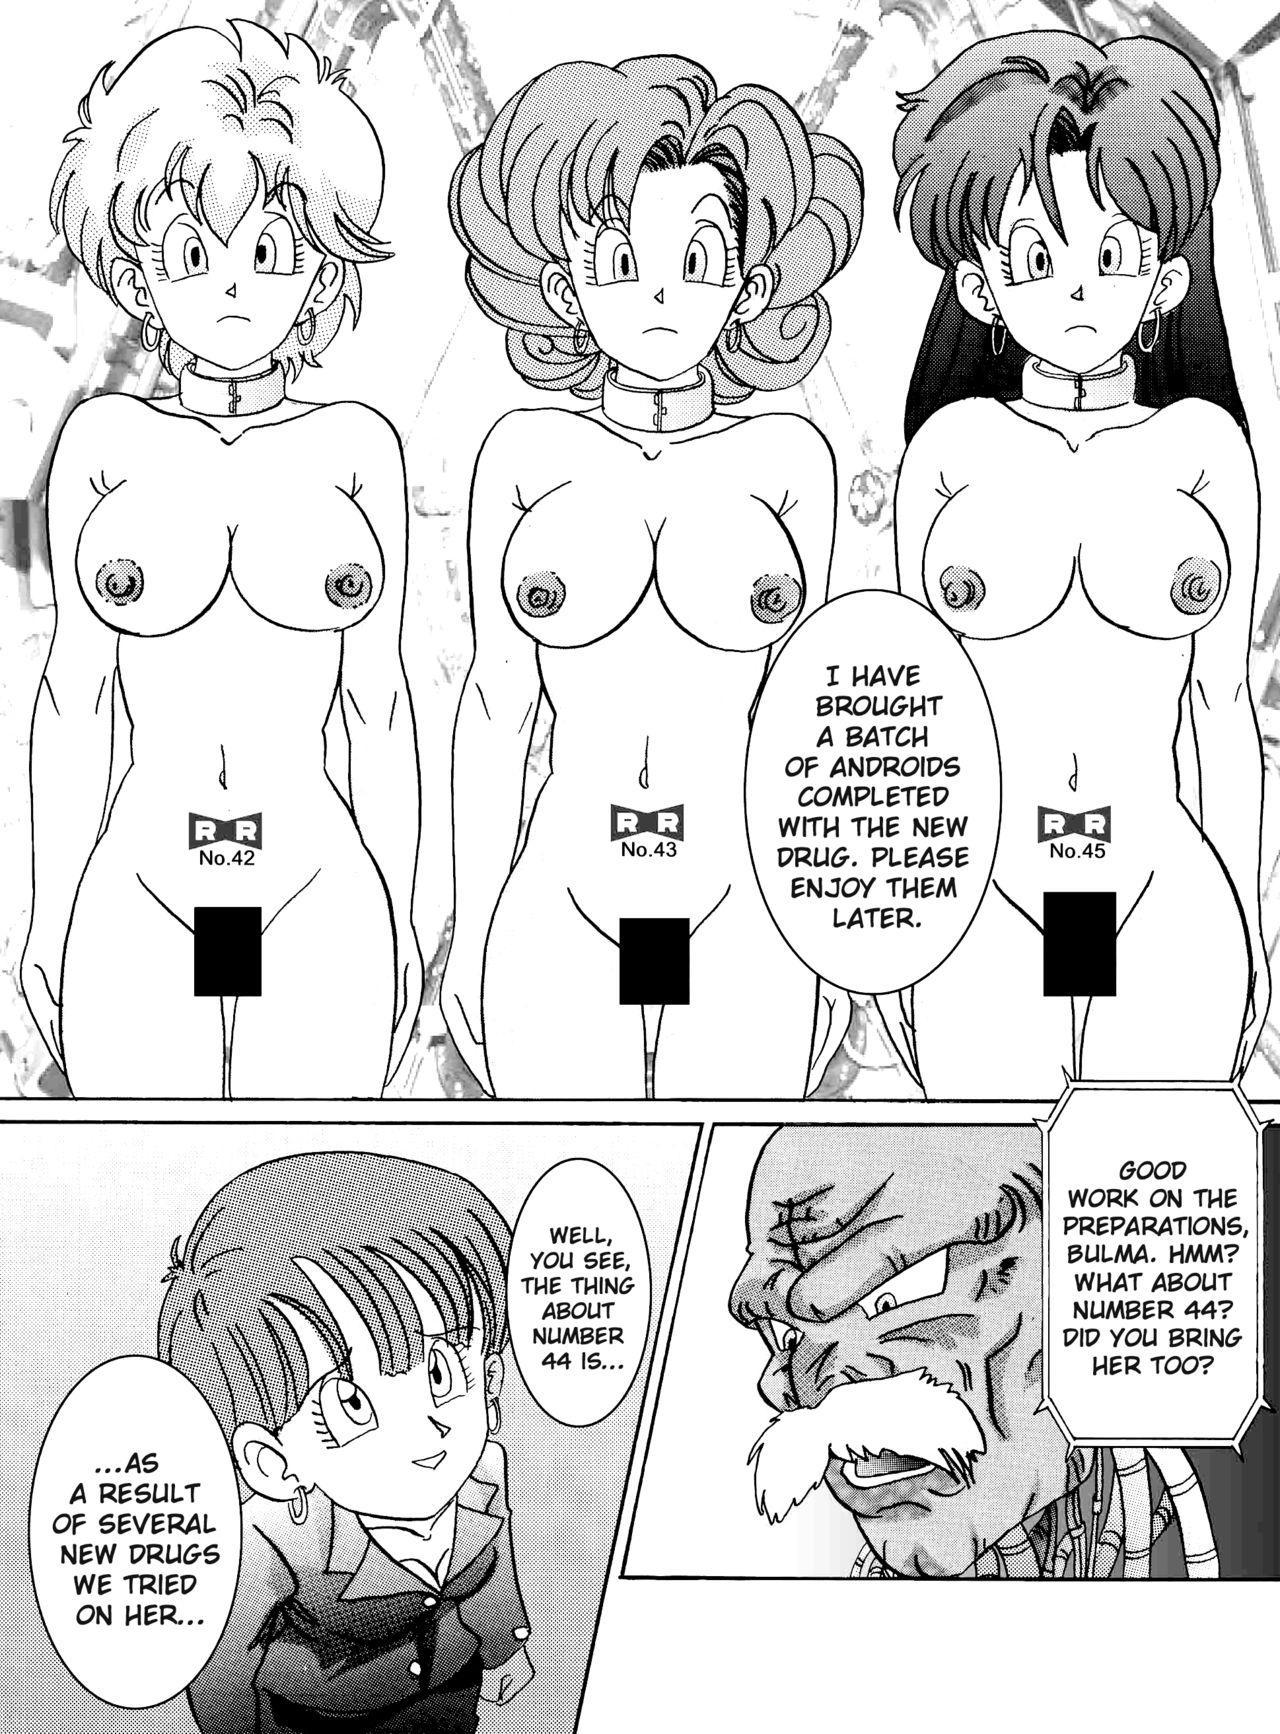 [Light Rate Port Pink] Tanjou!! Aku no Onna Senshi Jinzou Ningen 18-gou Sennou Kaizou Keikaku -Joshou- (Dragon Ball Z) [English] [ChoriScans] 8